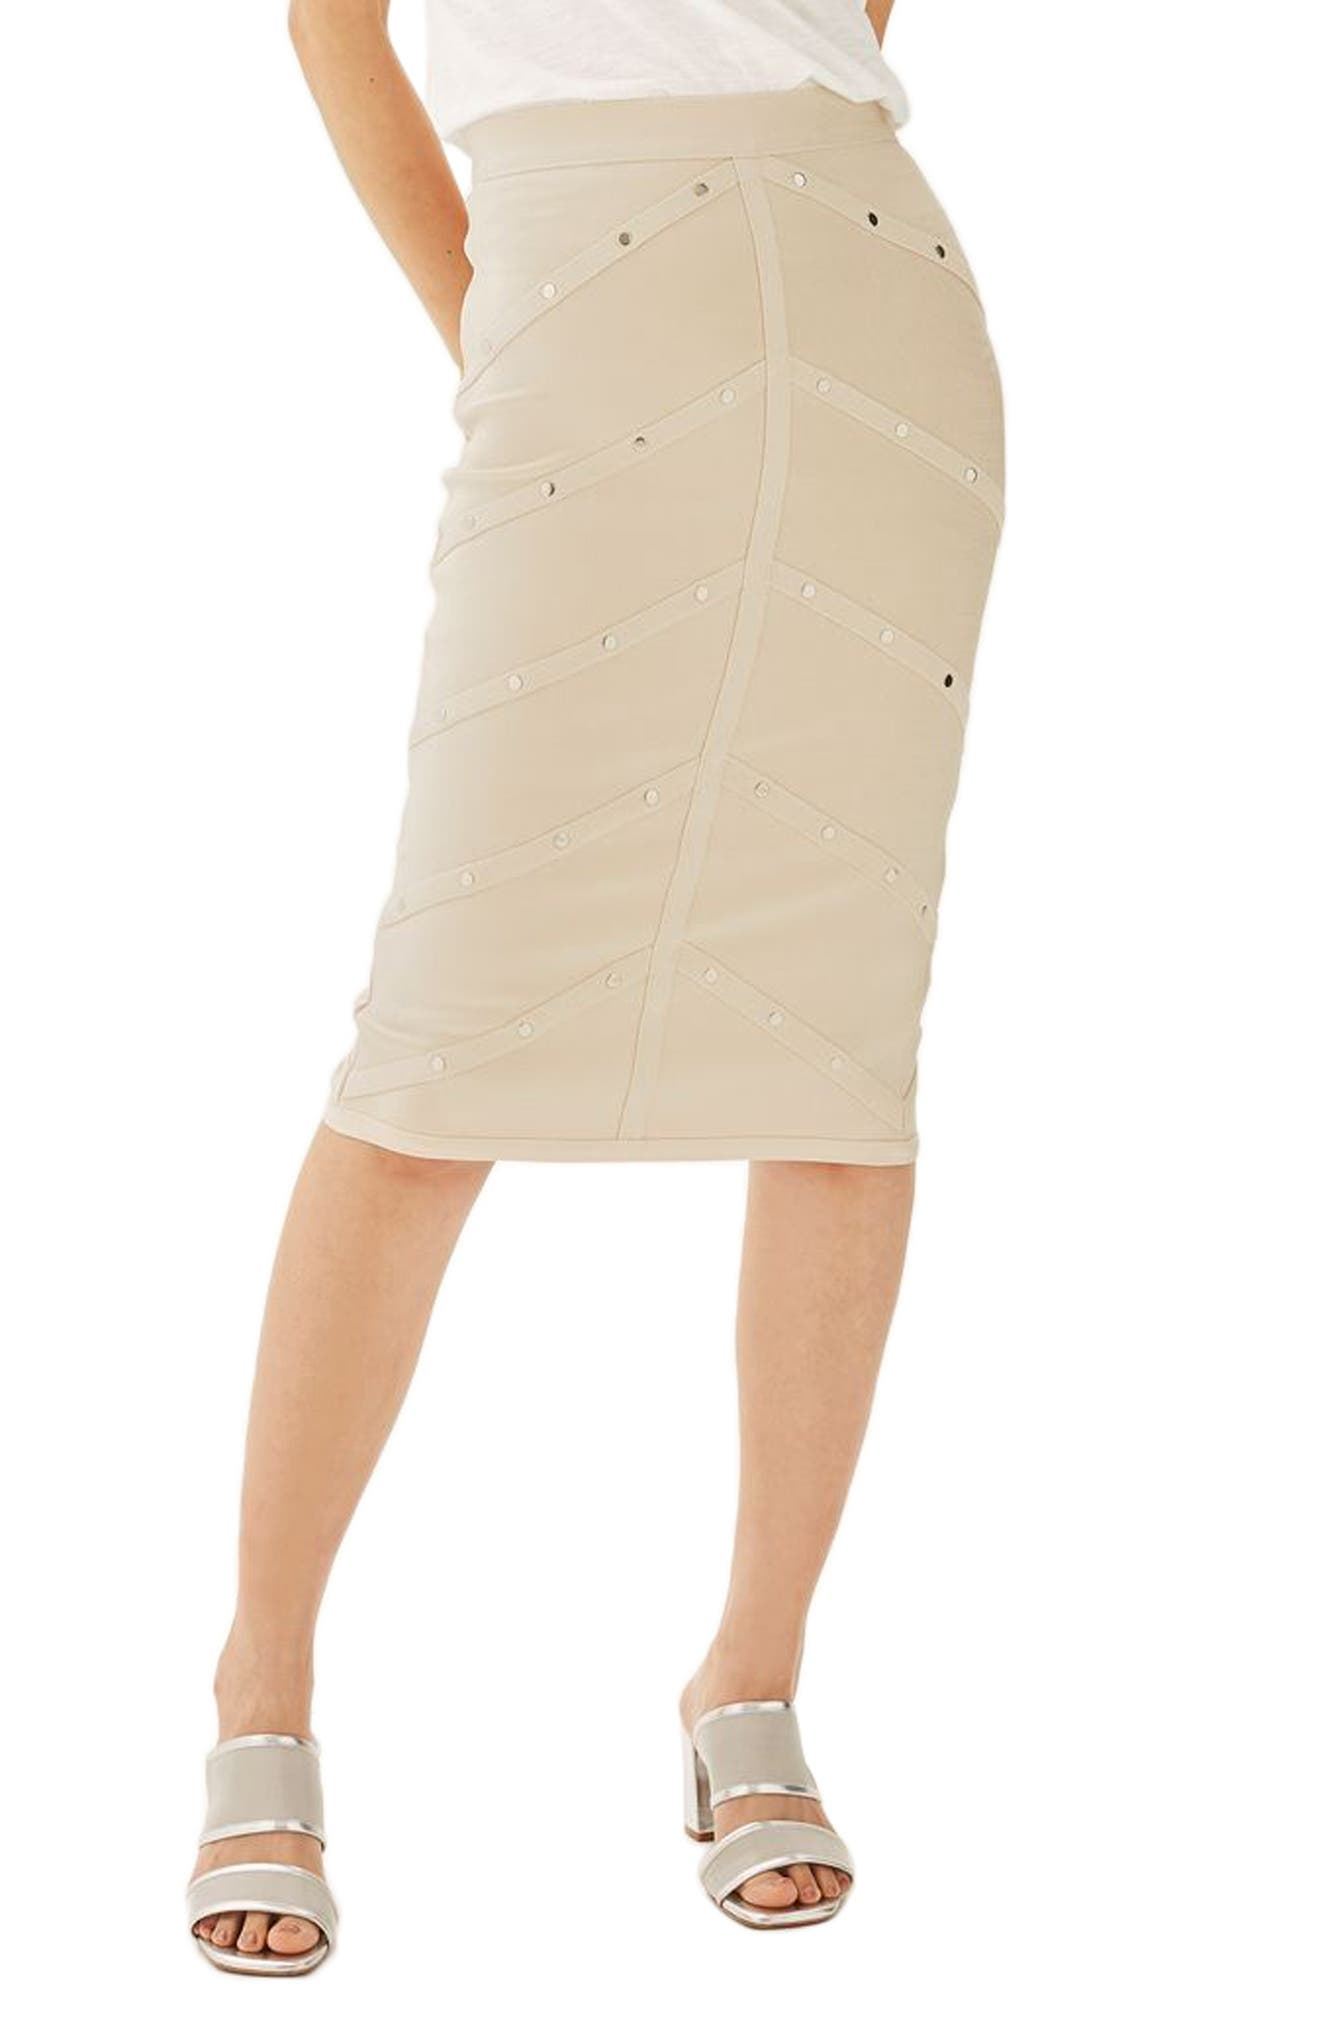 Topshop Stud Bandage Pencil Skirt (Petite)